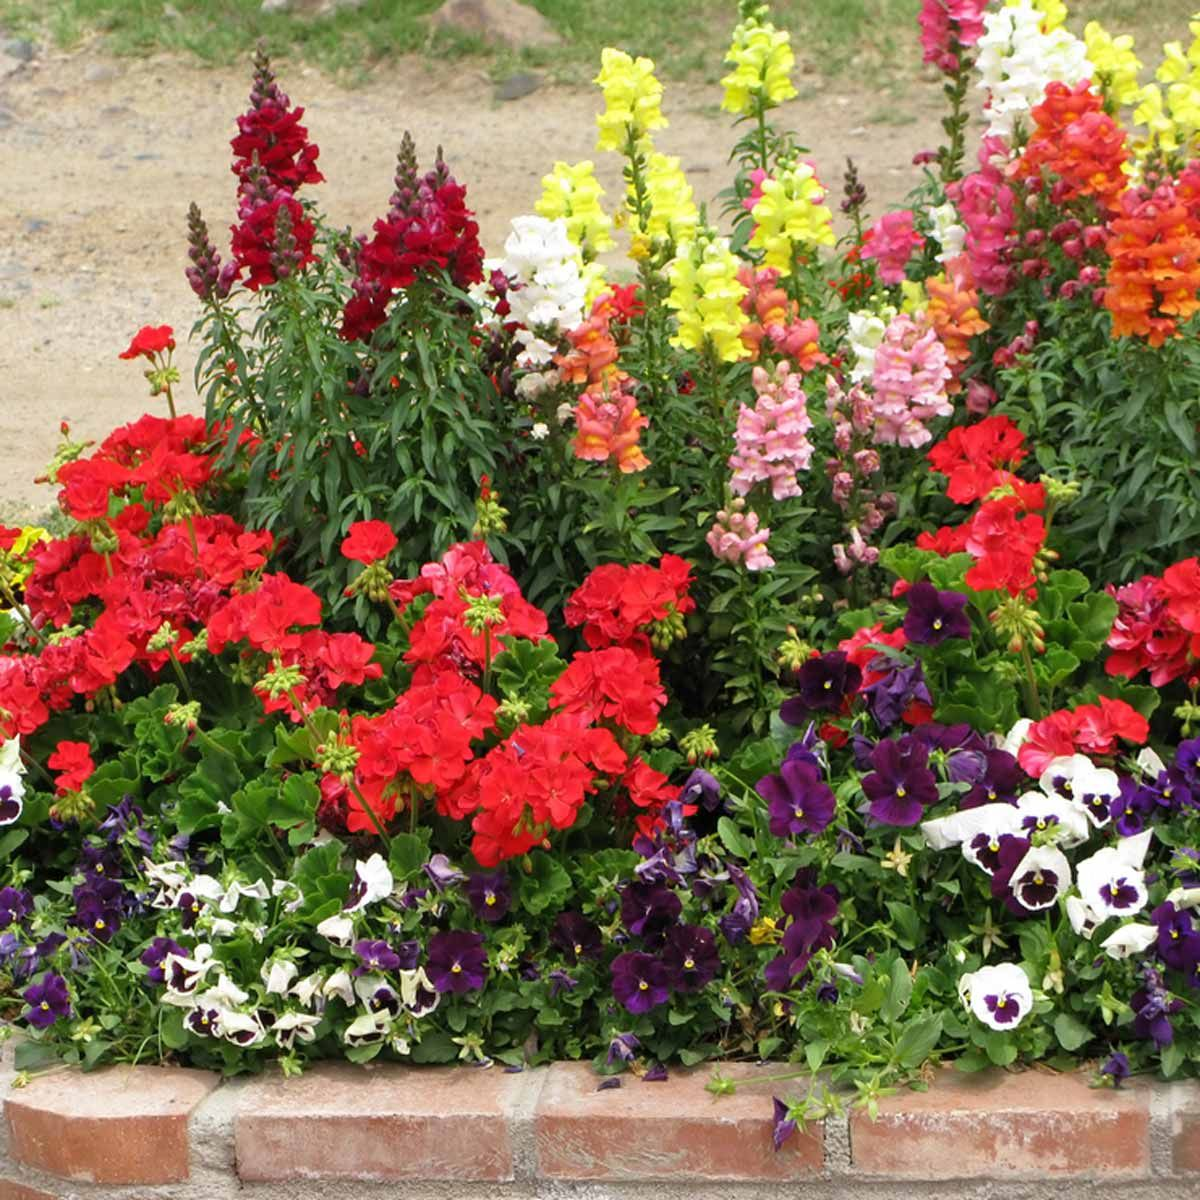 12 Inspiring Garden Flower Bed Designs (With images